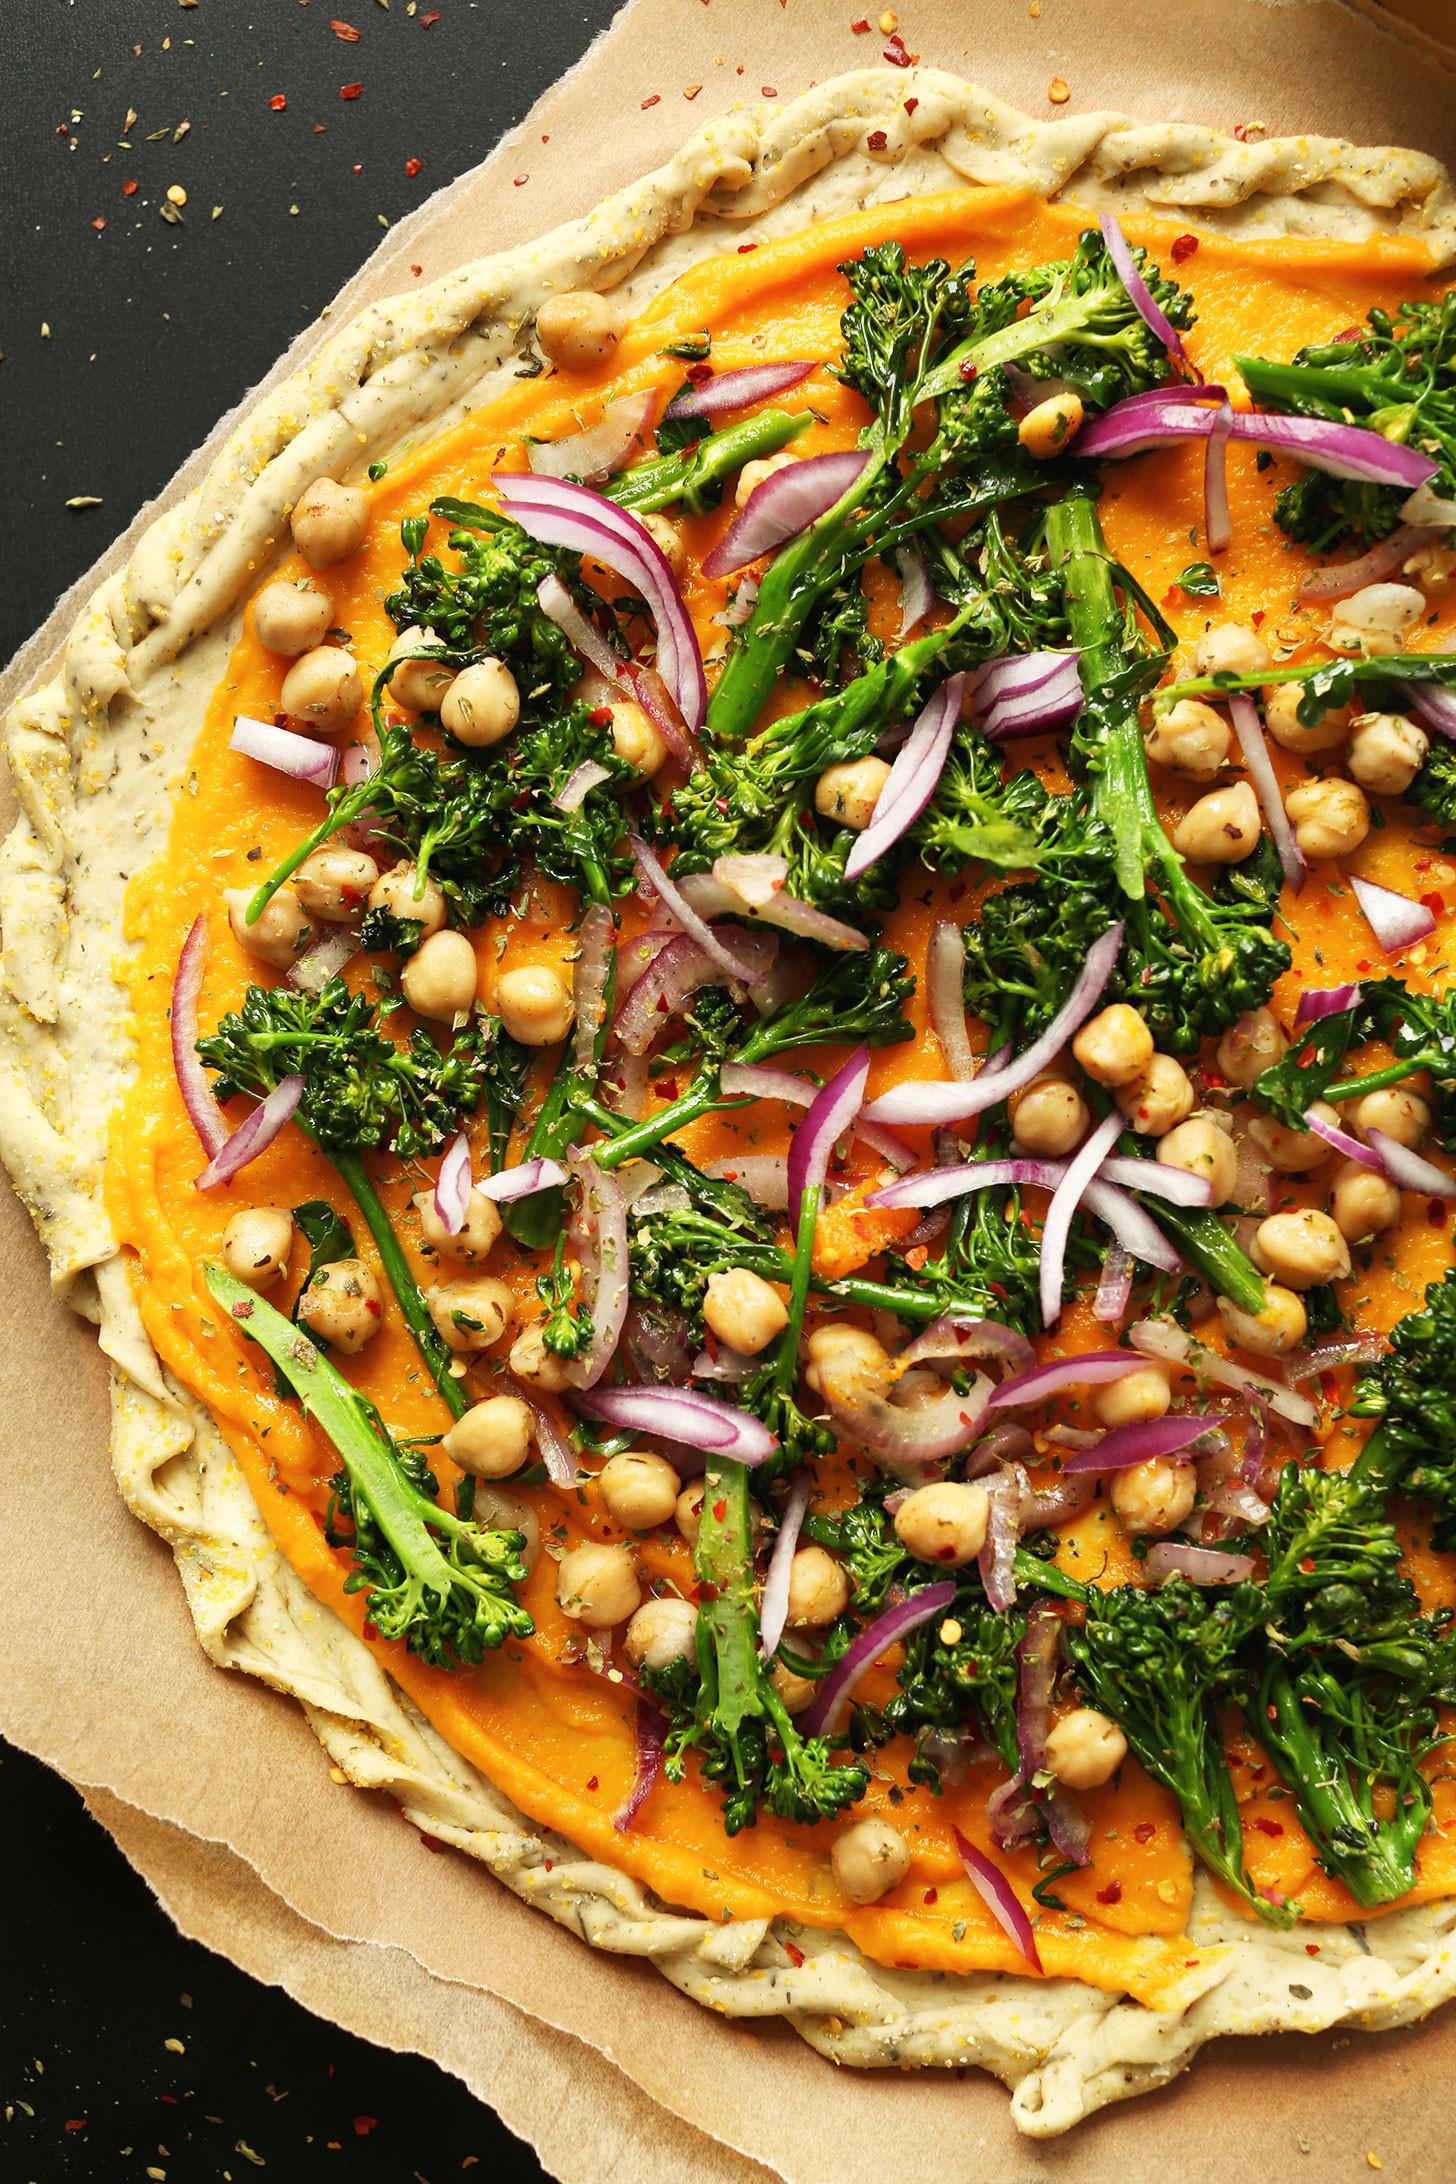 Best Vegan Dinner Recipes  30 delicious vegan dinner recipes for happy tummies